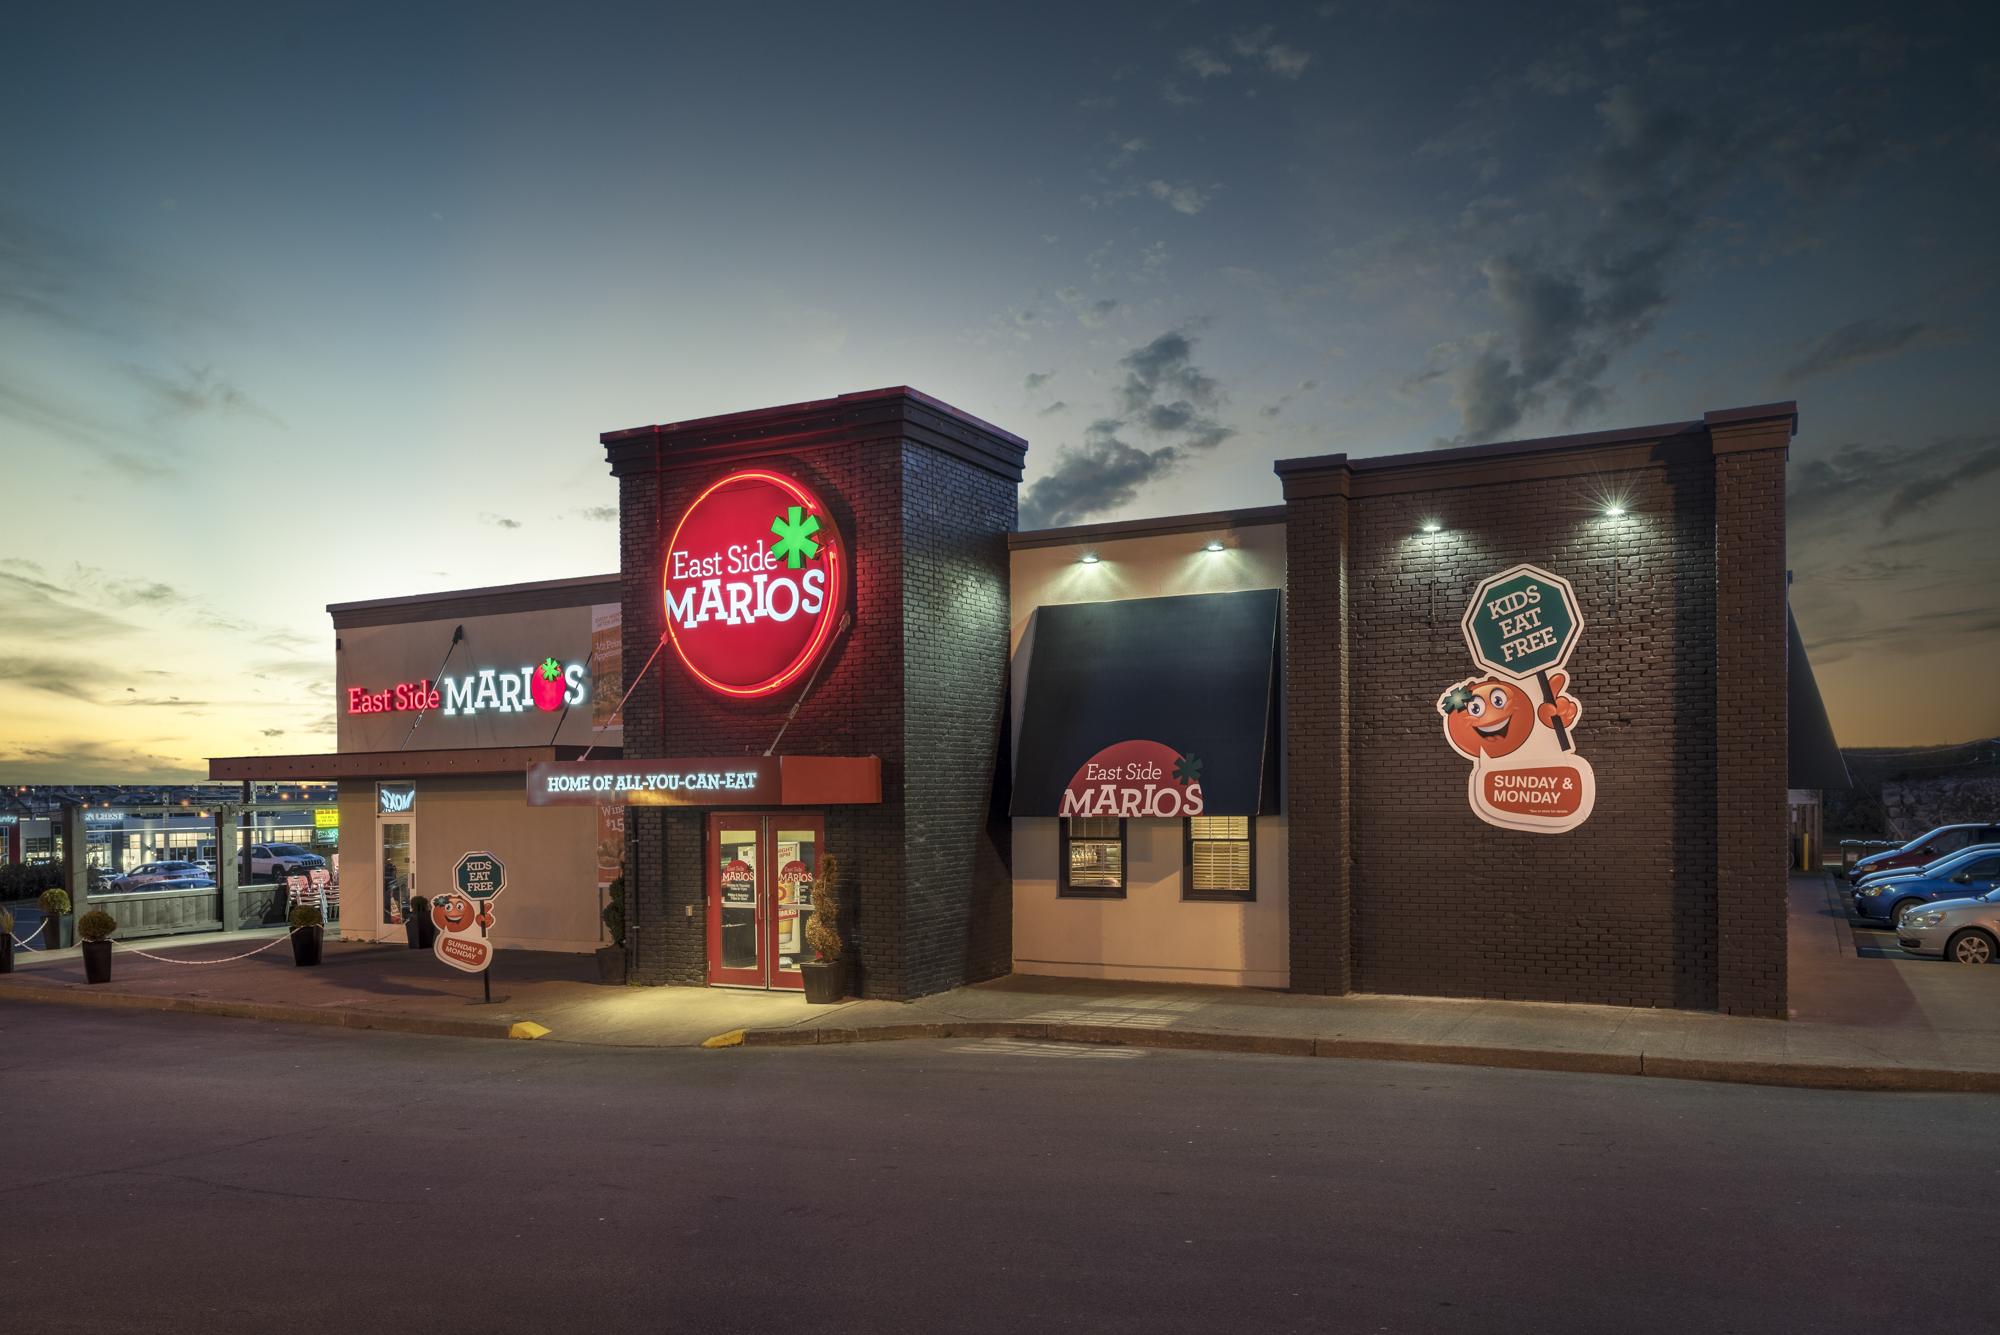 Eastside Marios Exterior.jpg